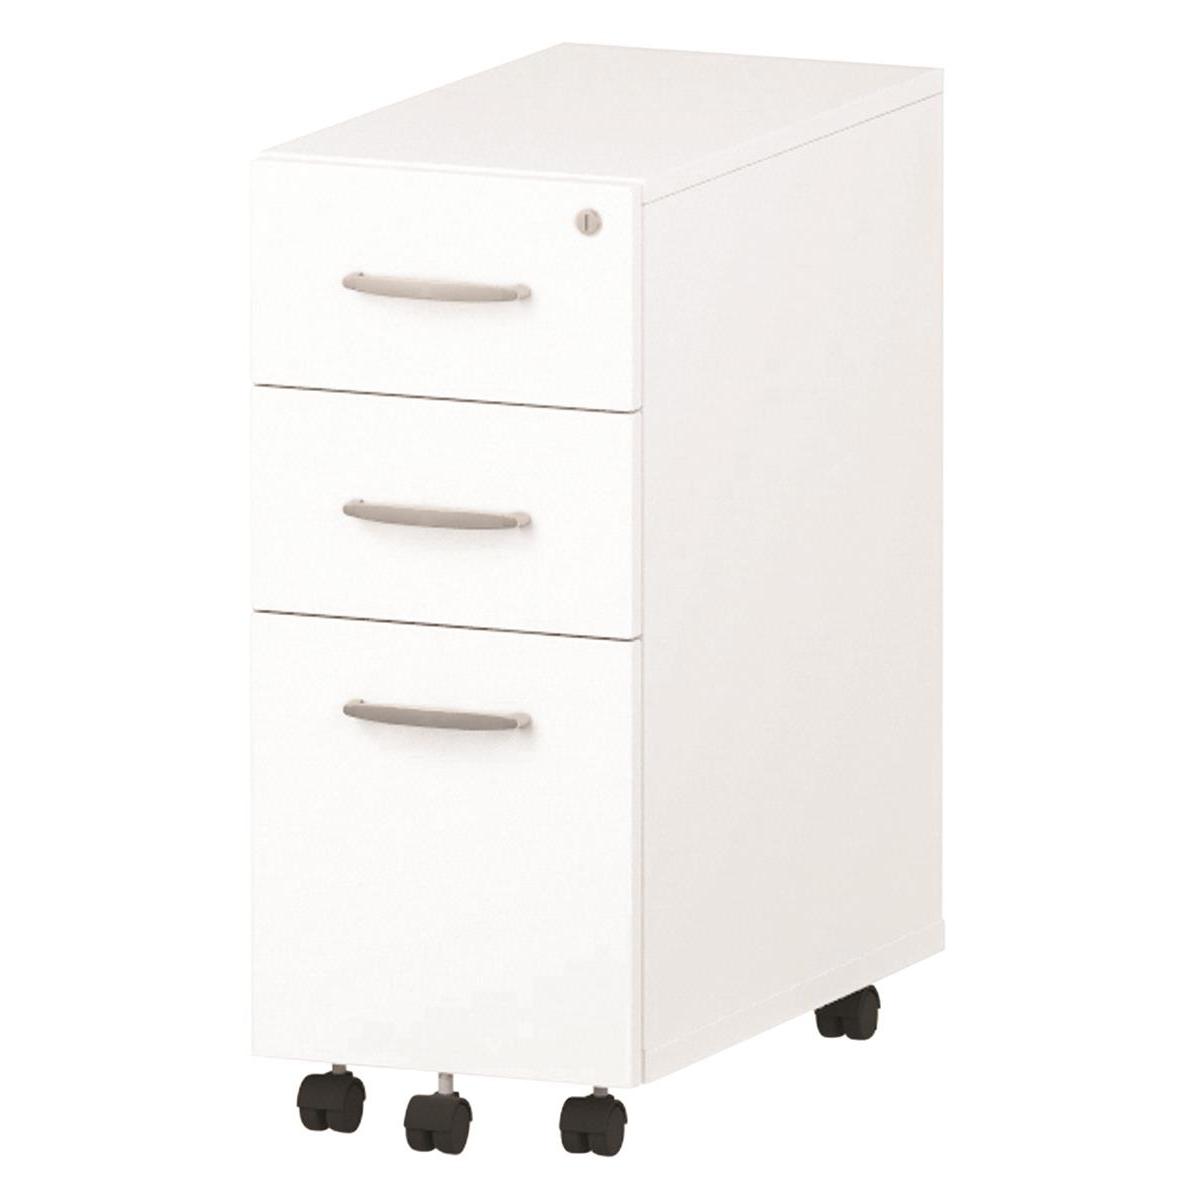 Trexus Tall Narrow Mobile Pedestal 300x550x695mm White Ref I001655